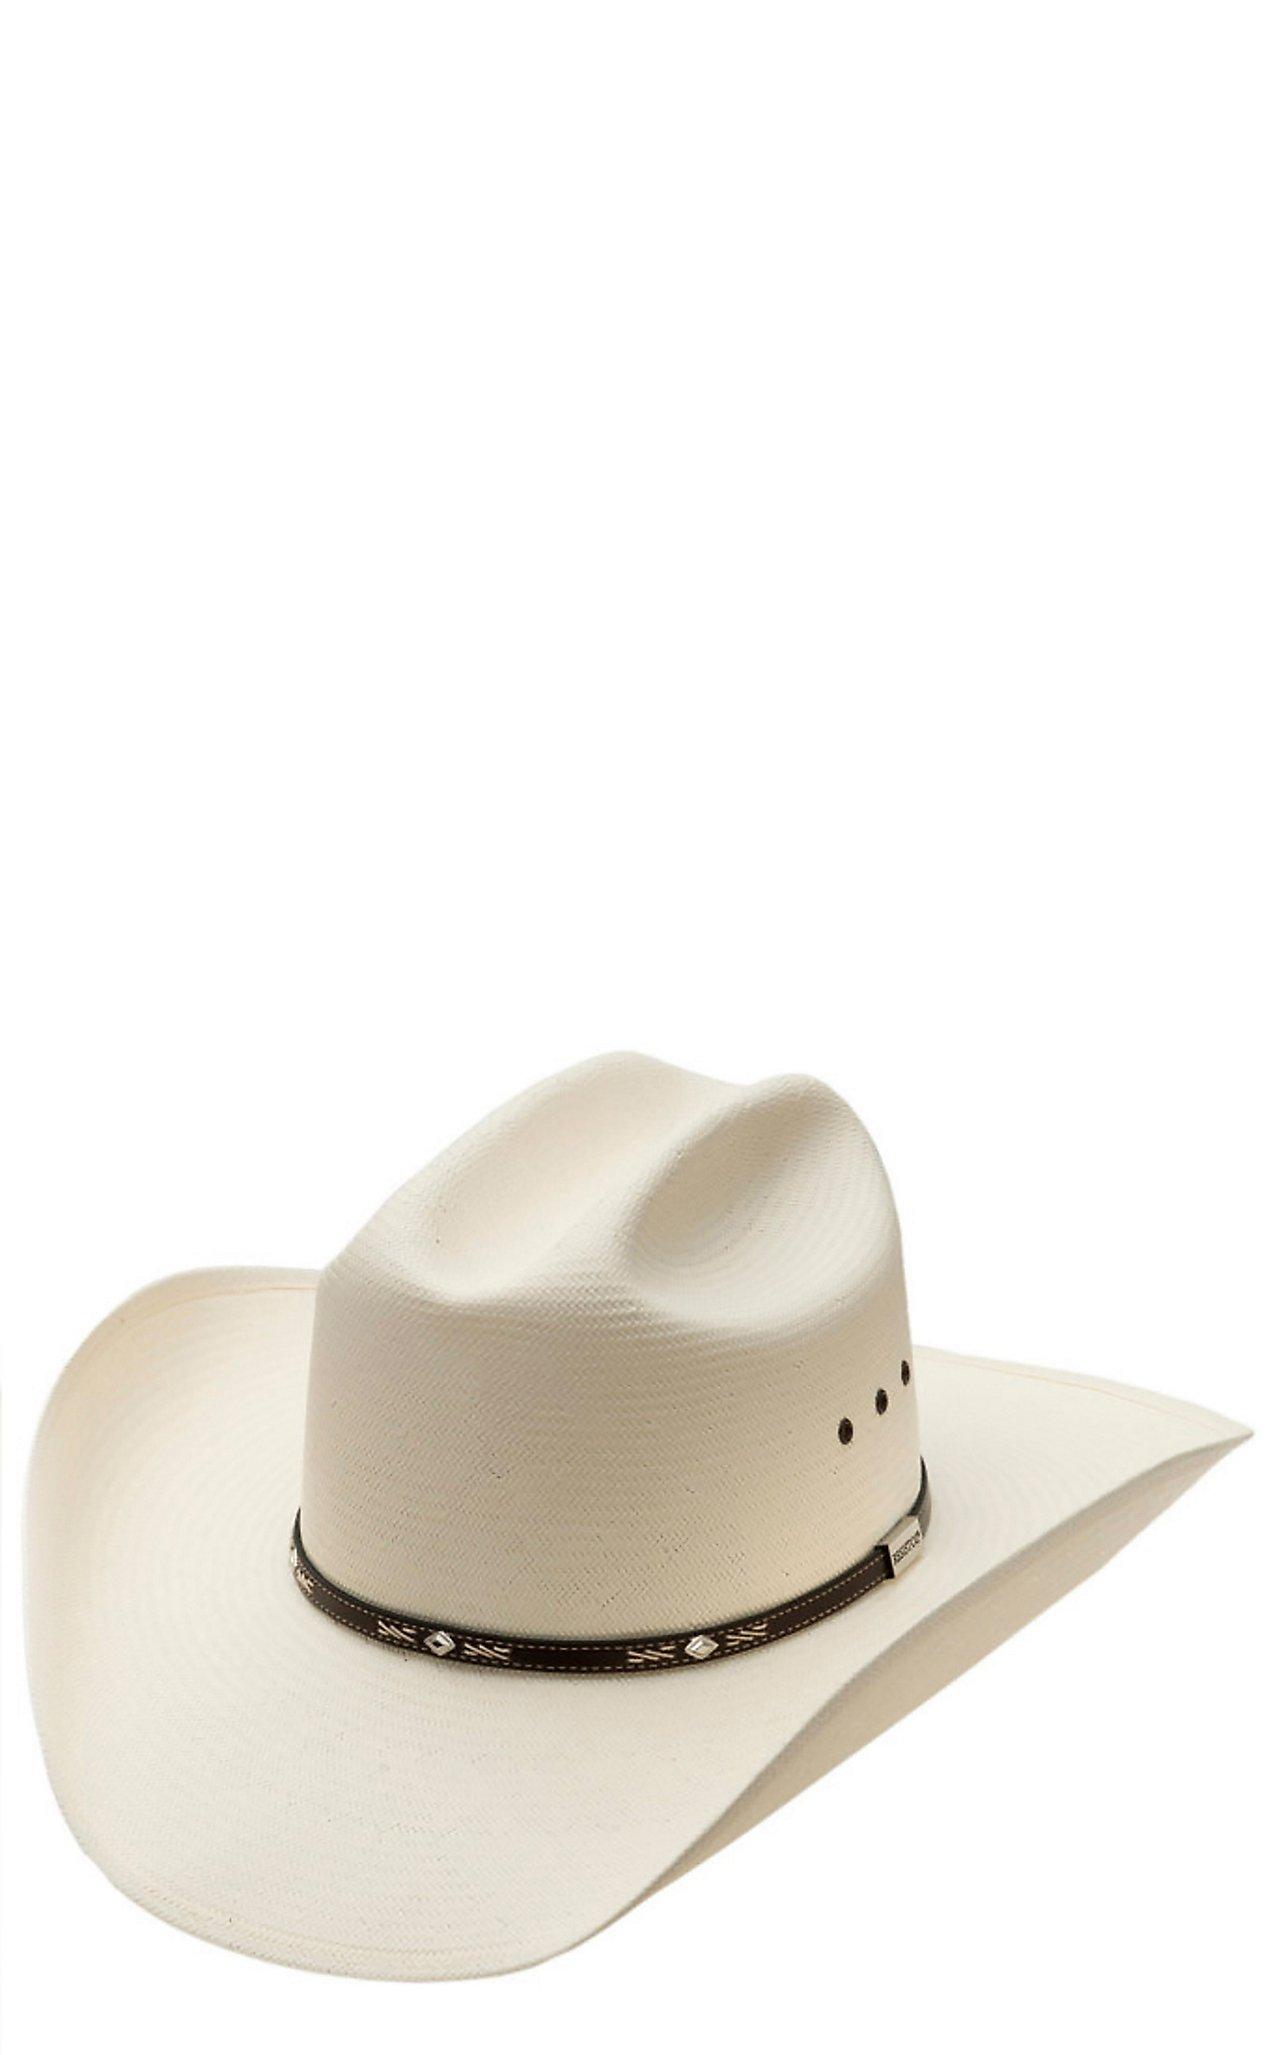 Resistol  Resistol 10X George Strait Lambert Straw Cowboy Hat 0614413ff34